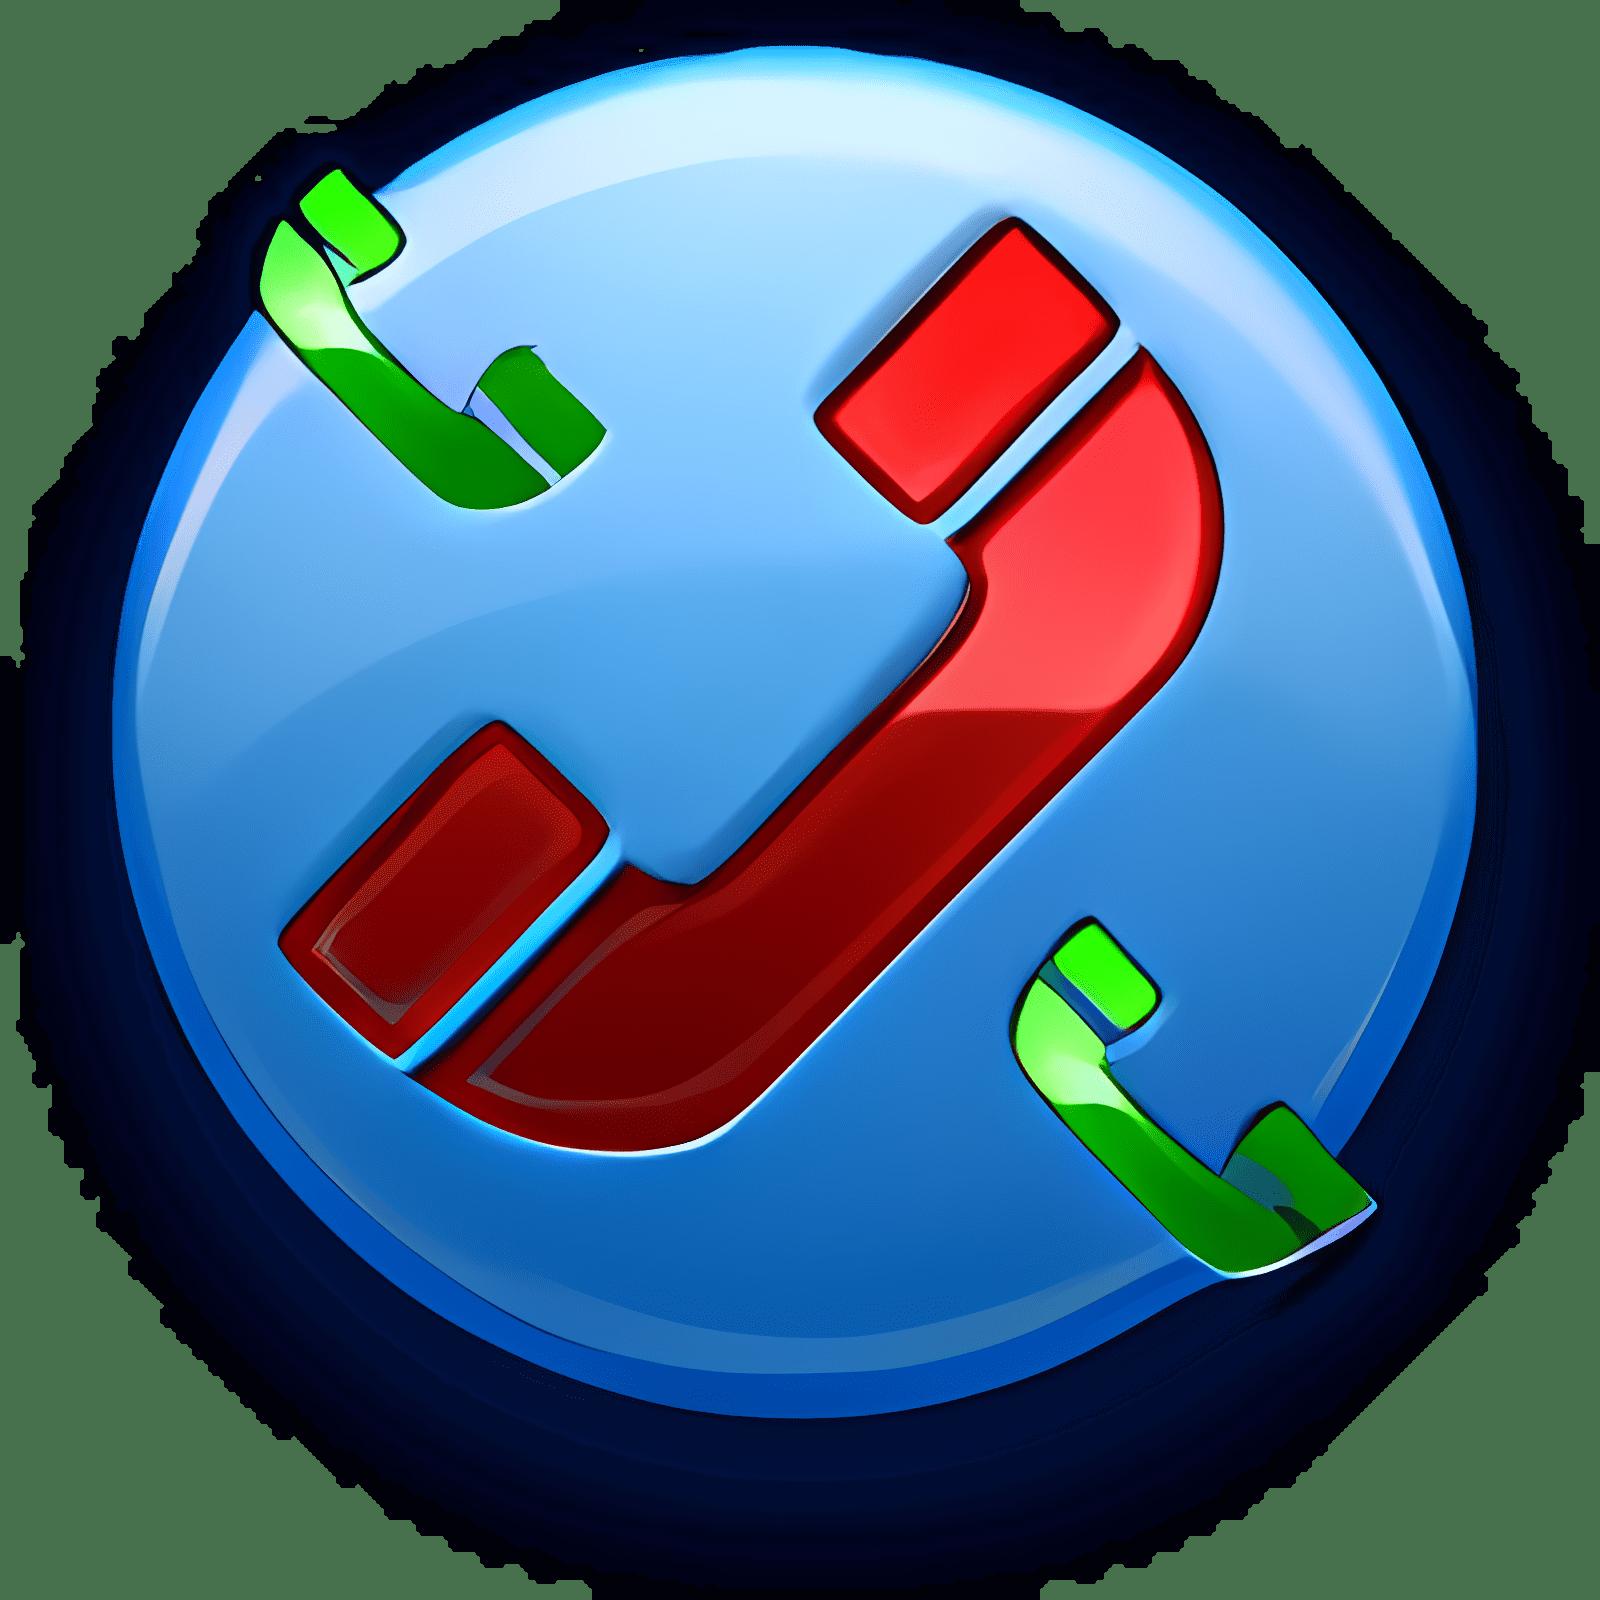 CallFreq 3.0.2